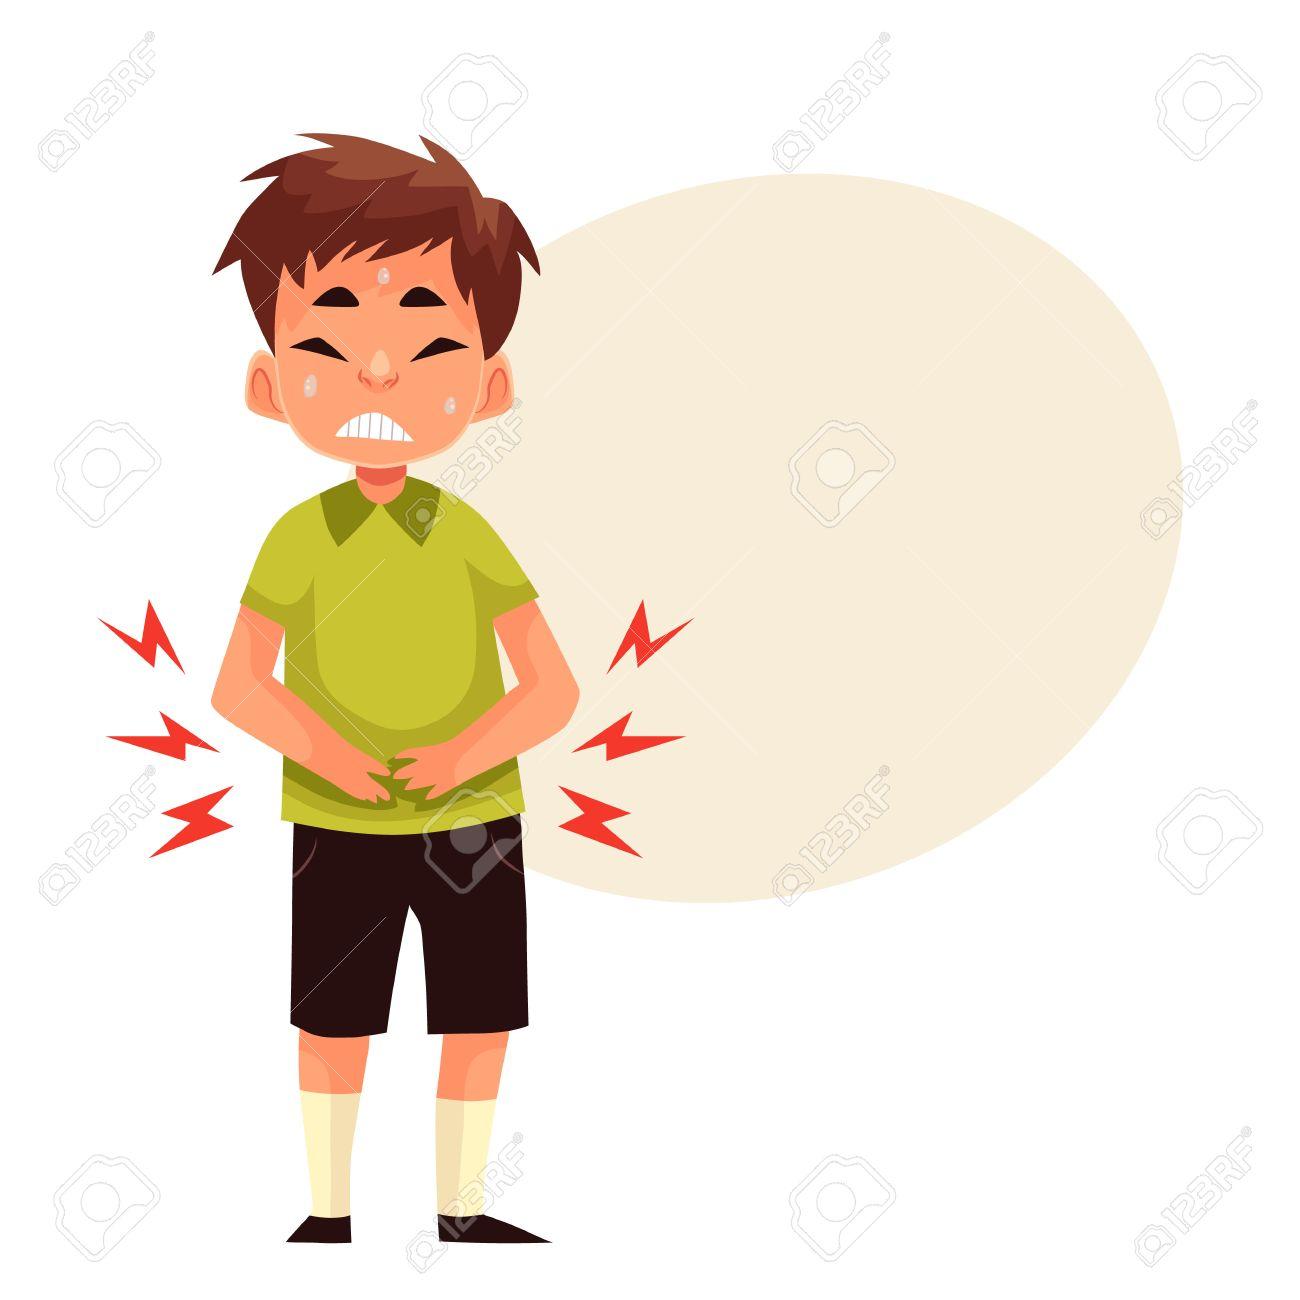 Person Stomach Pain Cartoon